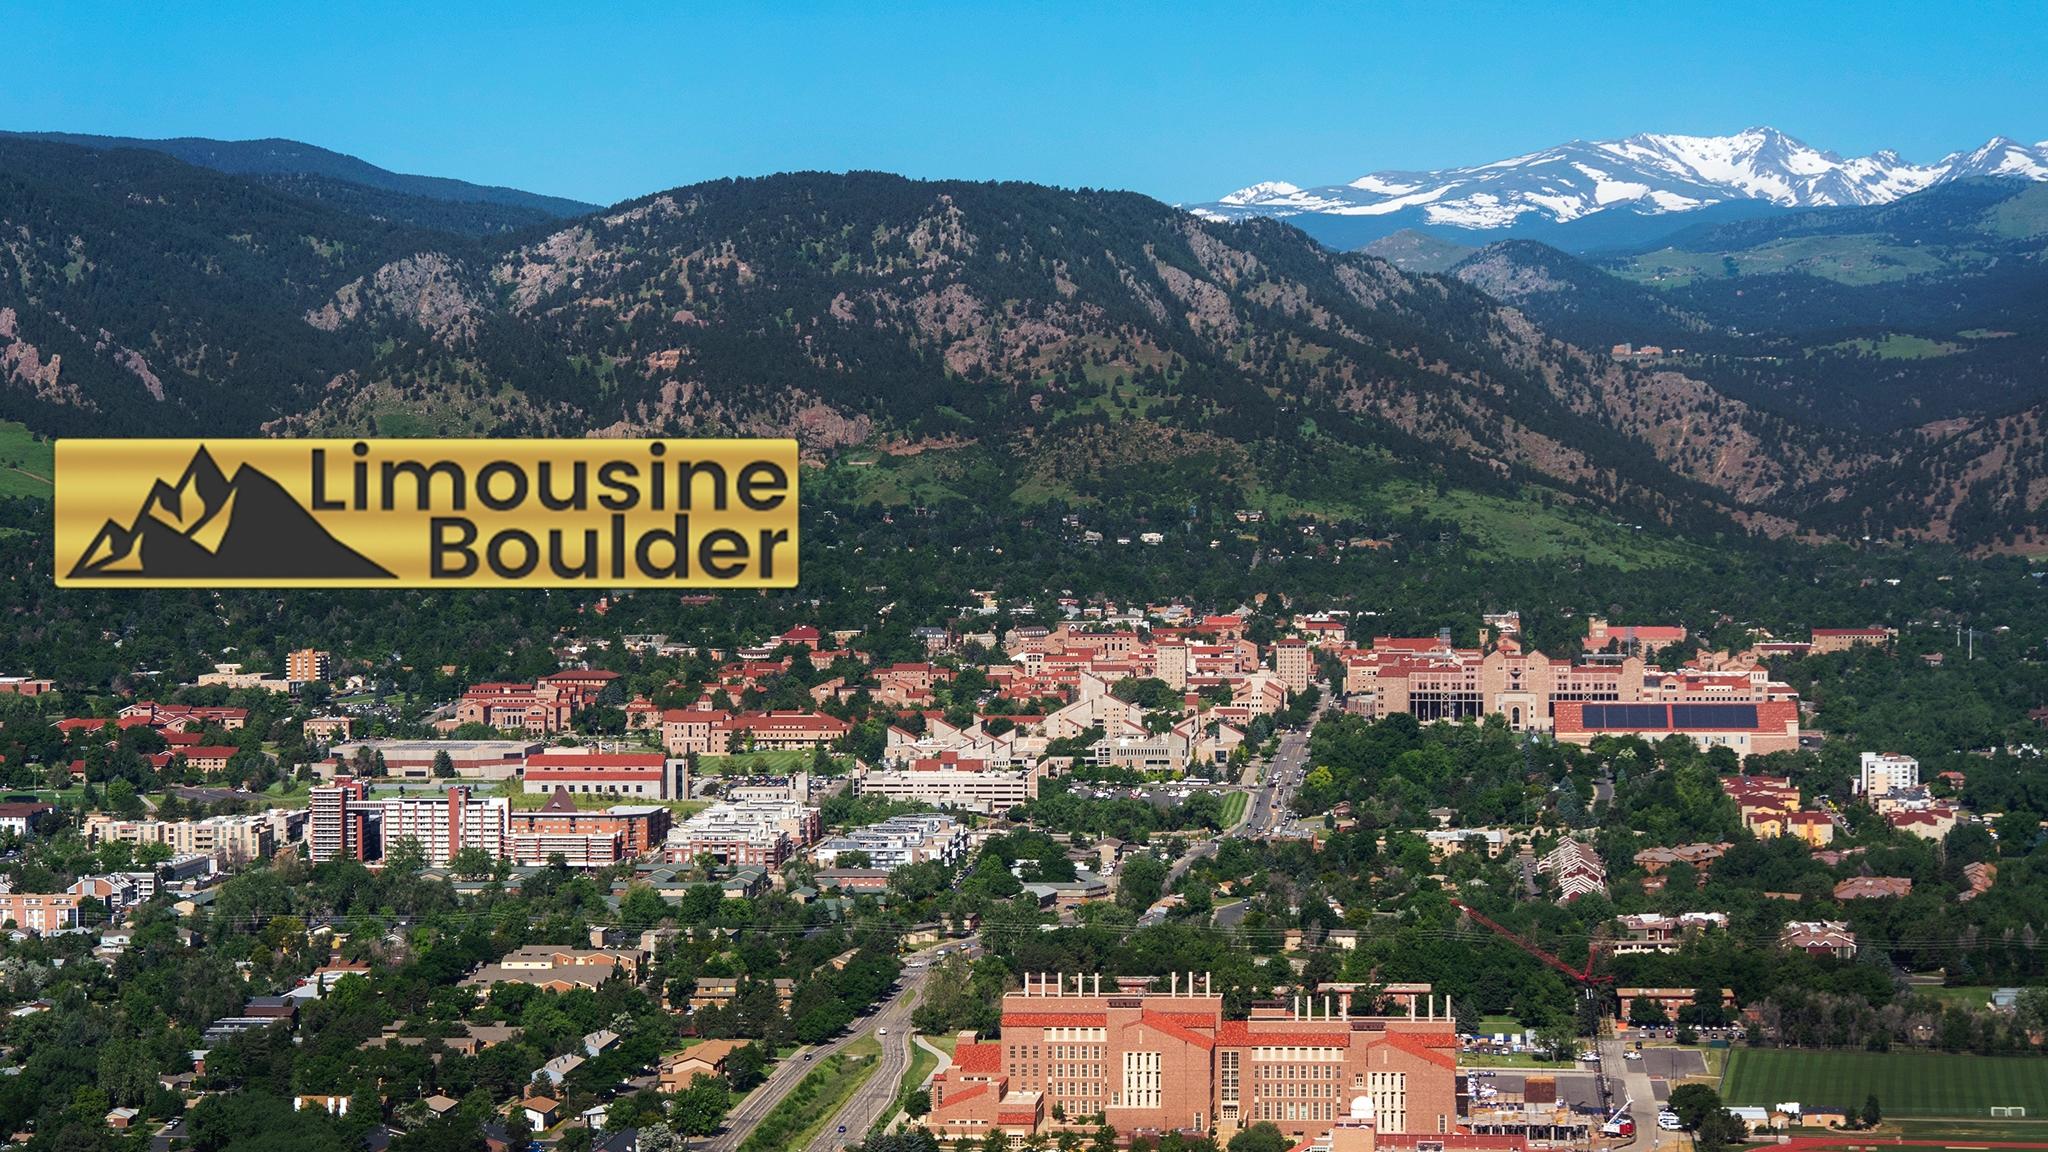 Limousine Boulder (@limousineboulder) Cover Image